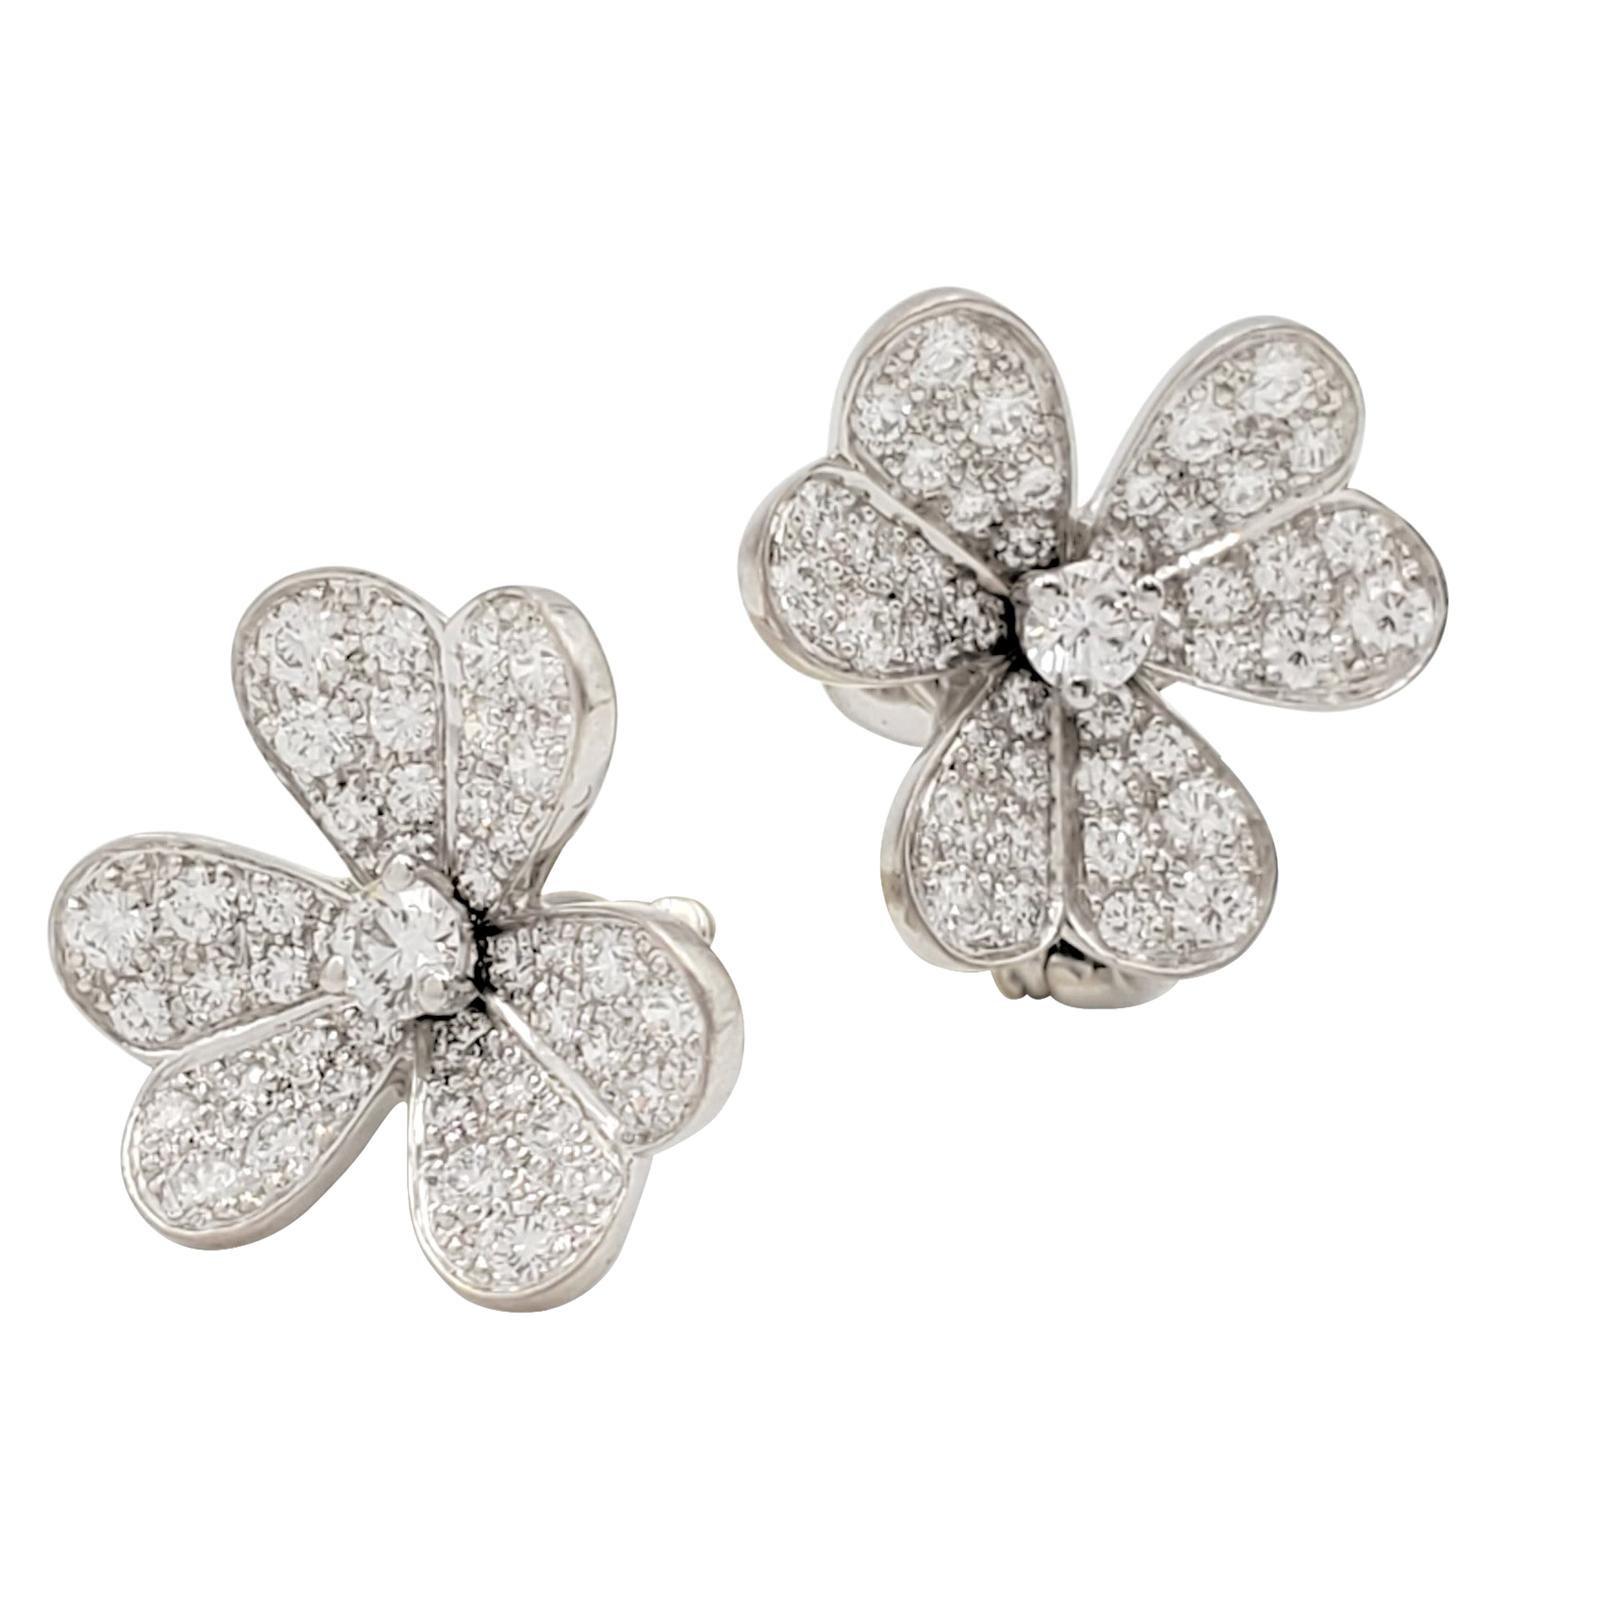 Van Cleef & Arpels 'Frivole' White Gold and Diamond Earrings, Small Model